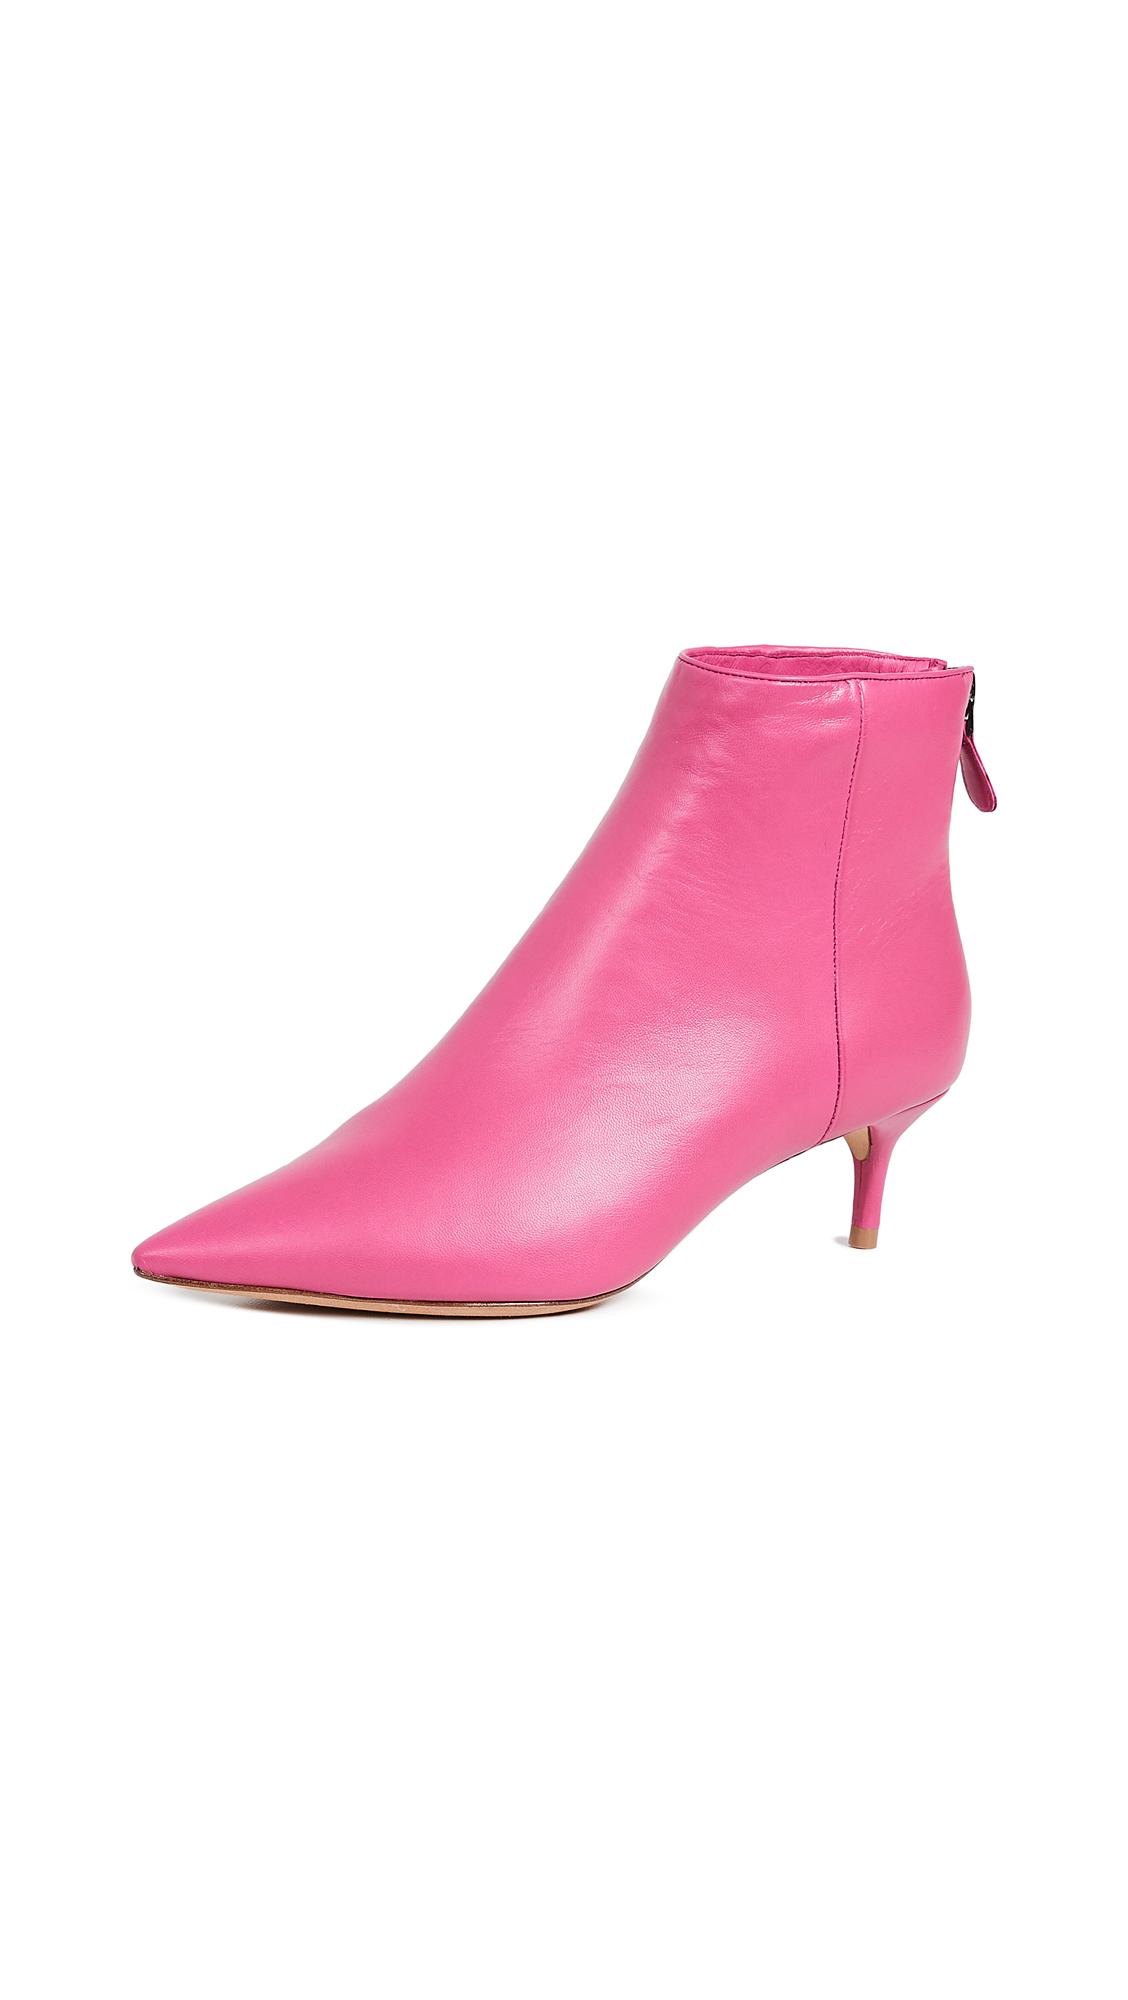 Alexandre Birman Kittie Boots - Blossom